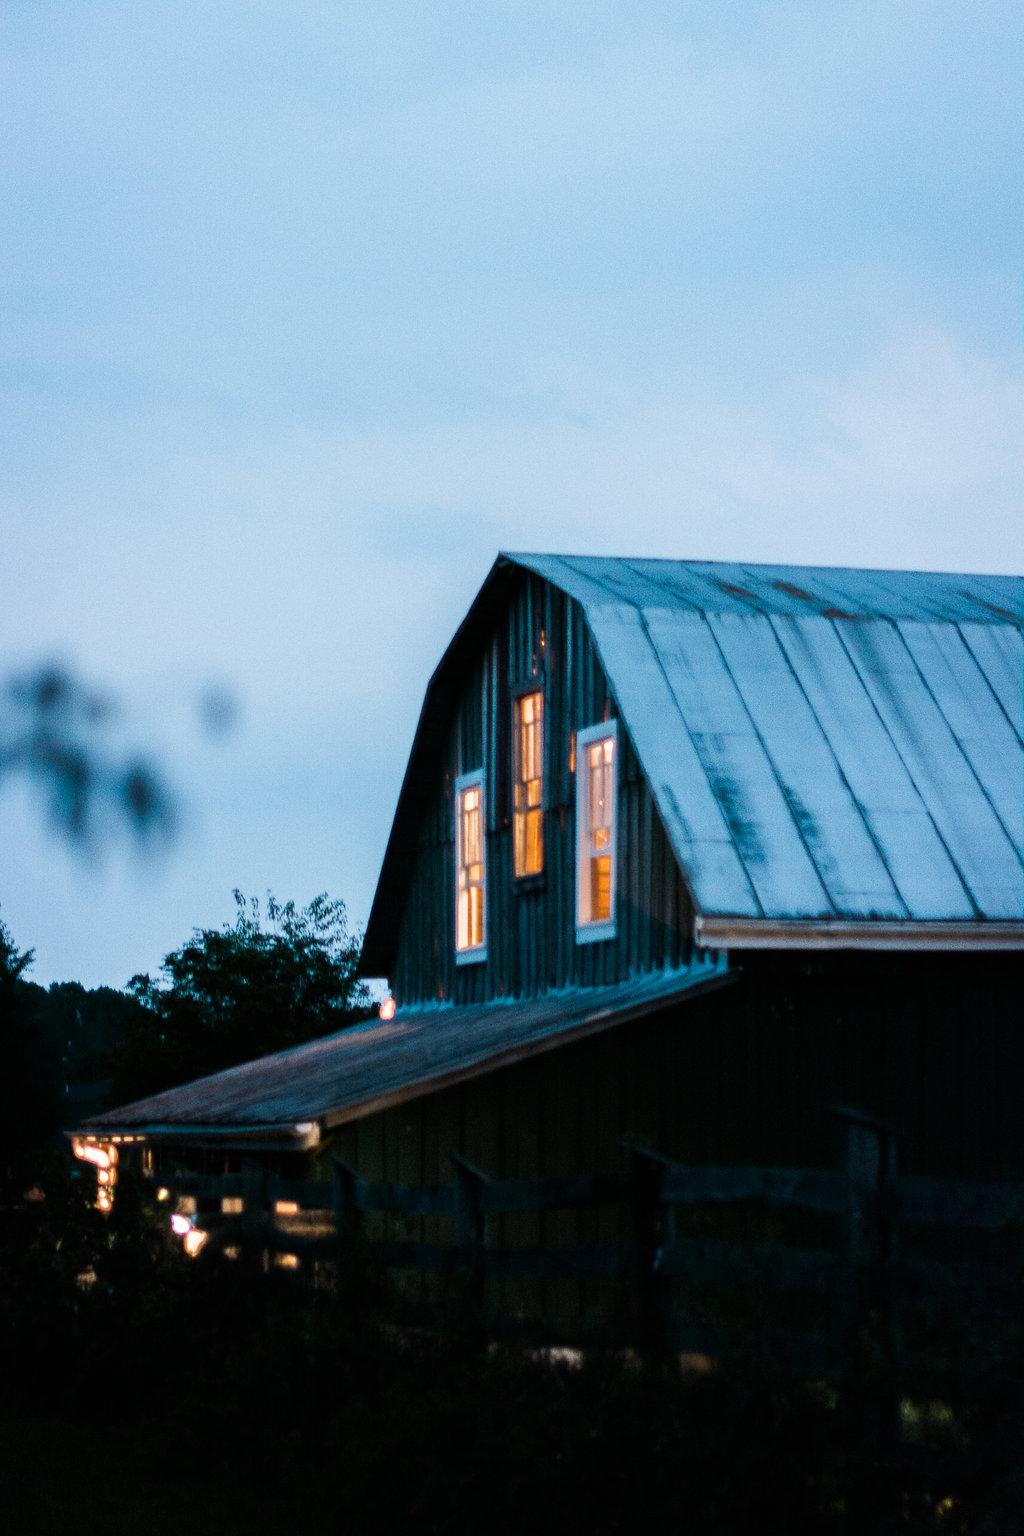 glasgow farm at blue hour photo